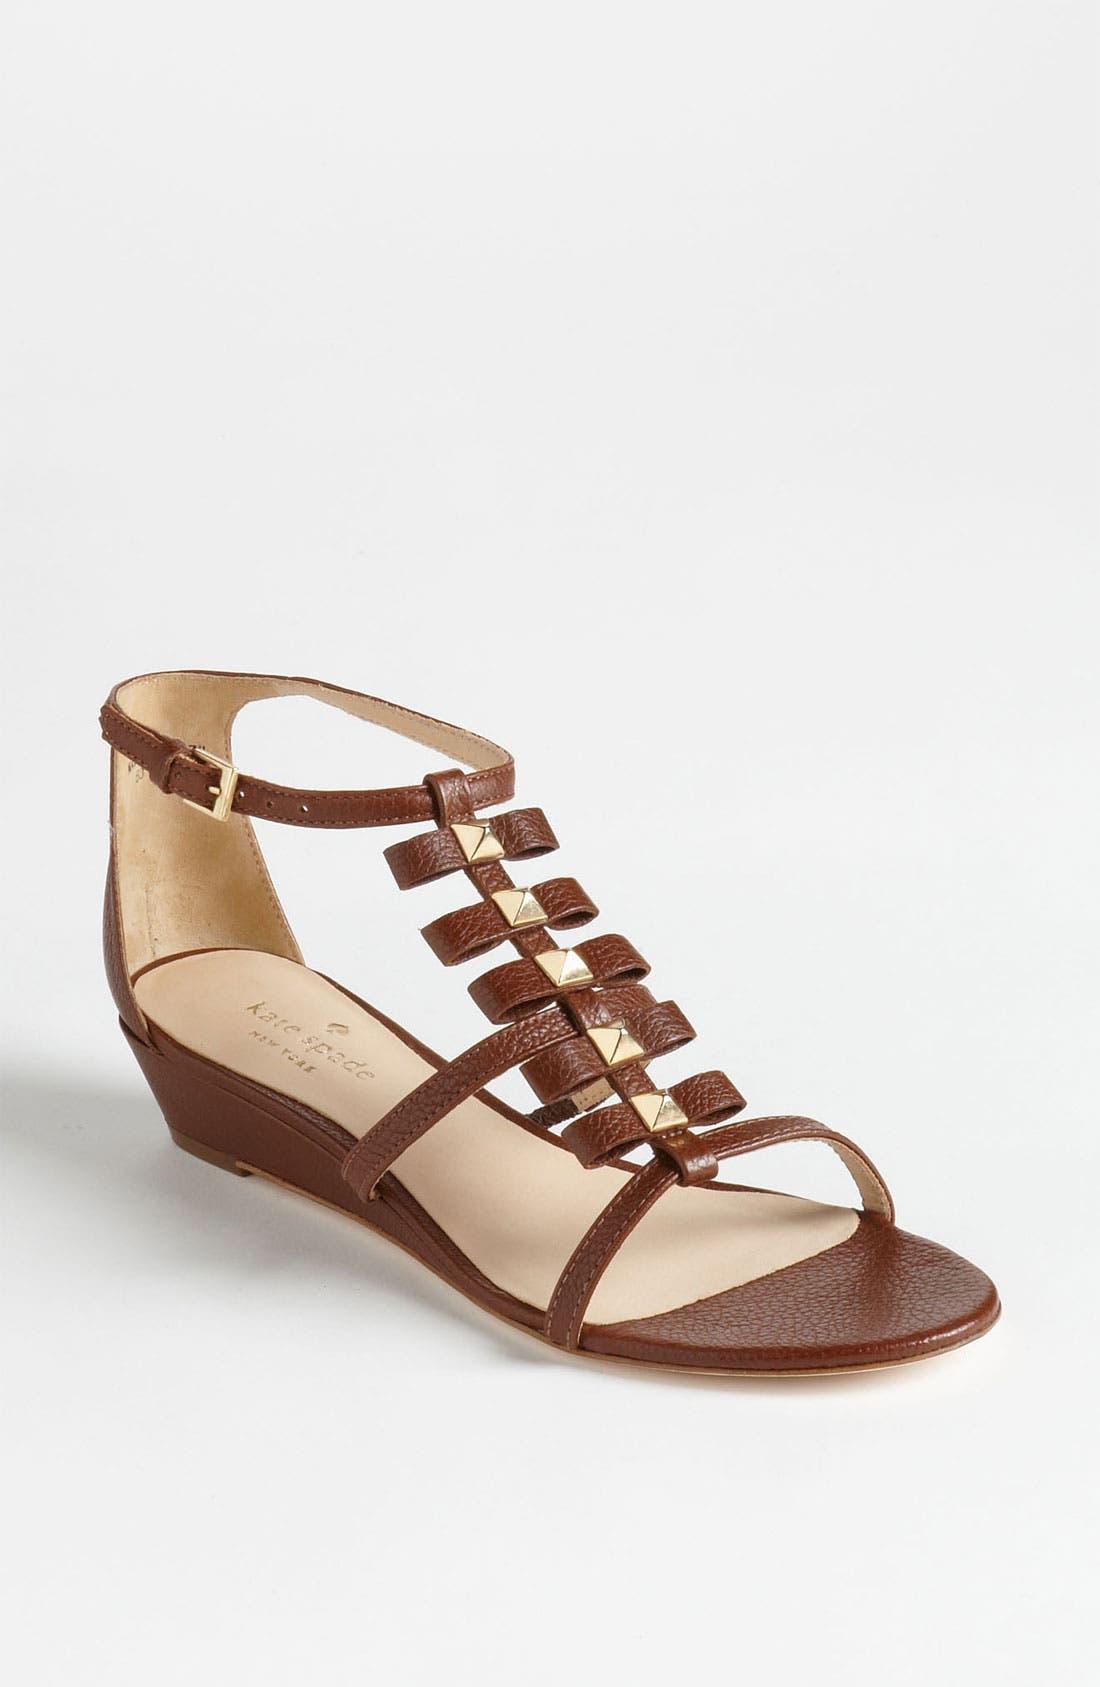 Alternate Image 1 Selected - kate spade new york 'vilina' sandal